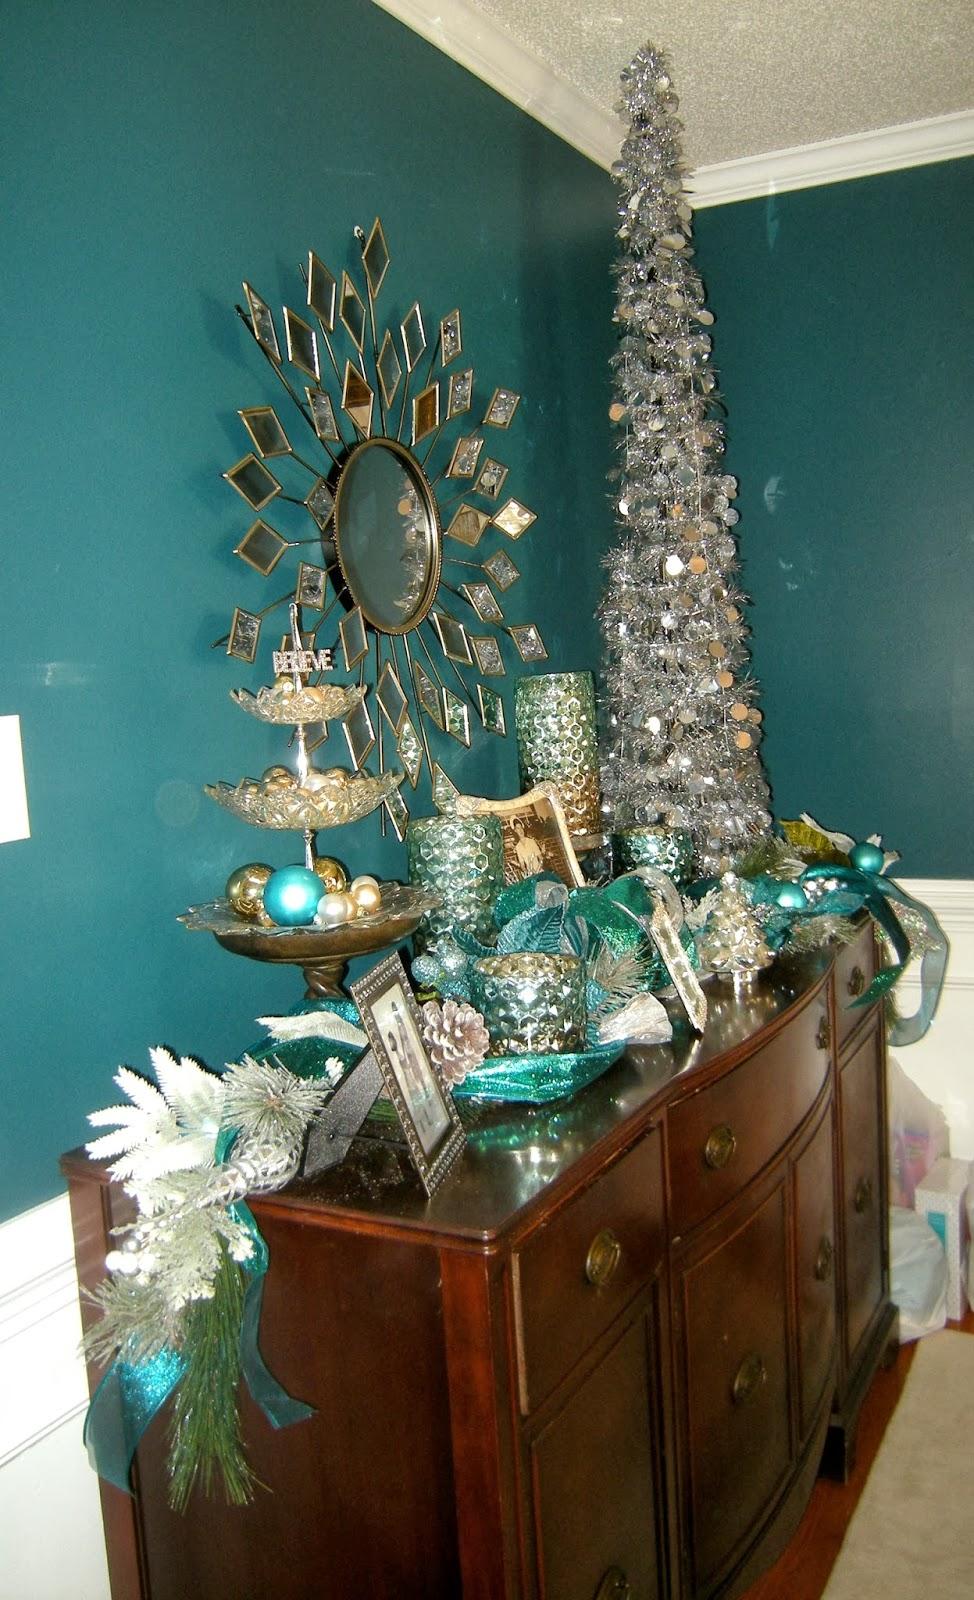 38 Teal Christmas Tree Decorations Ideas  Decoration Love